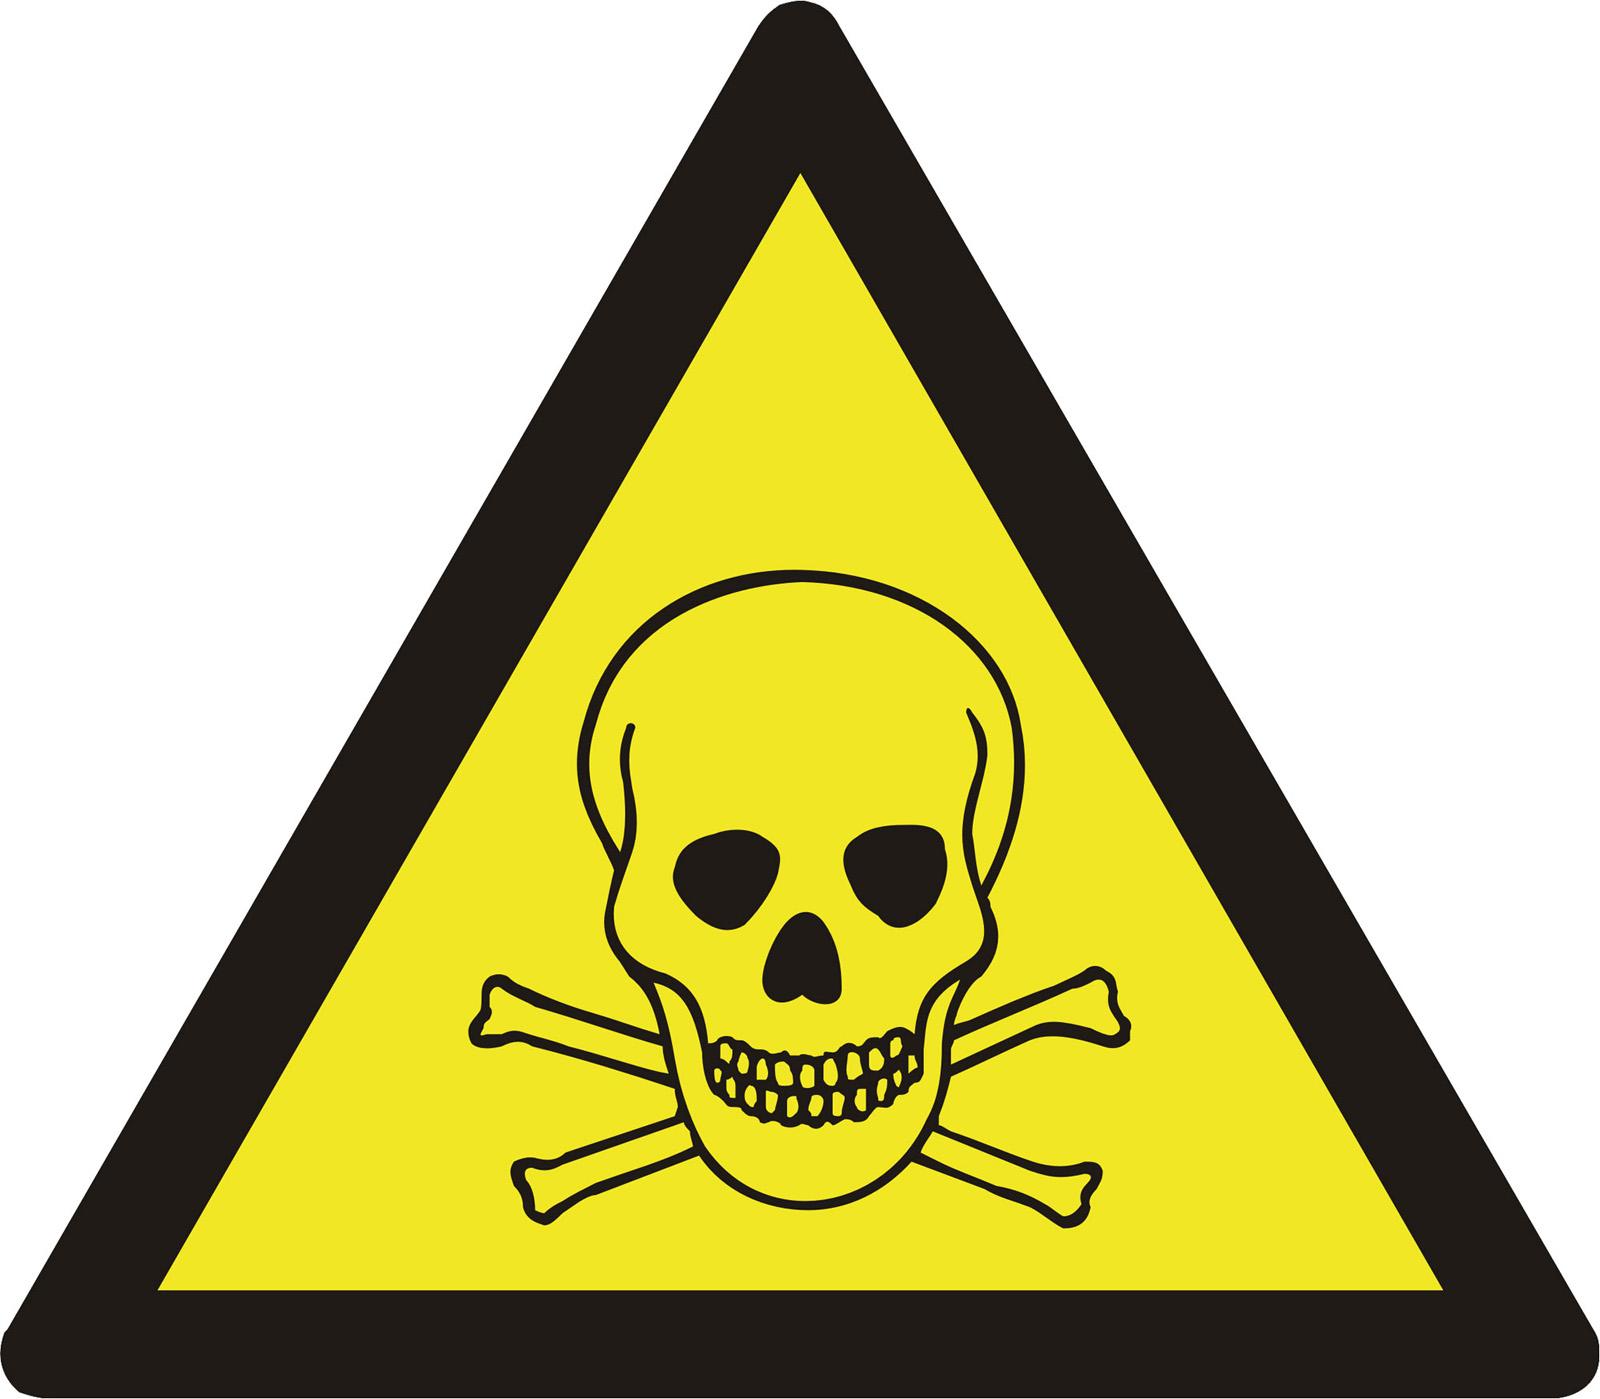 Very Toxic Warning Sign.